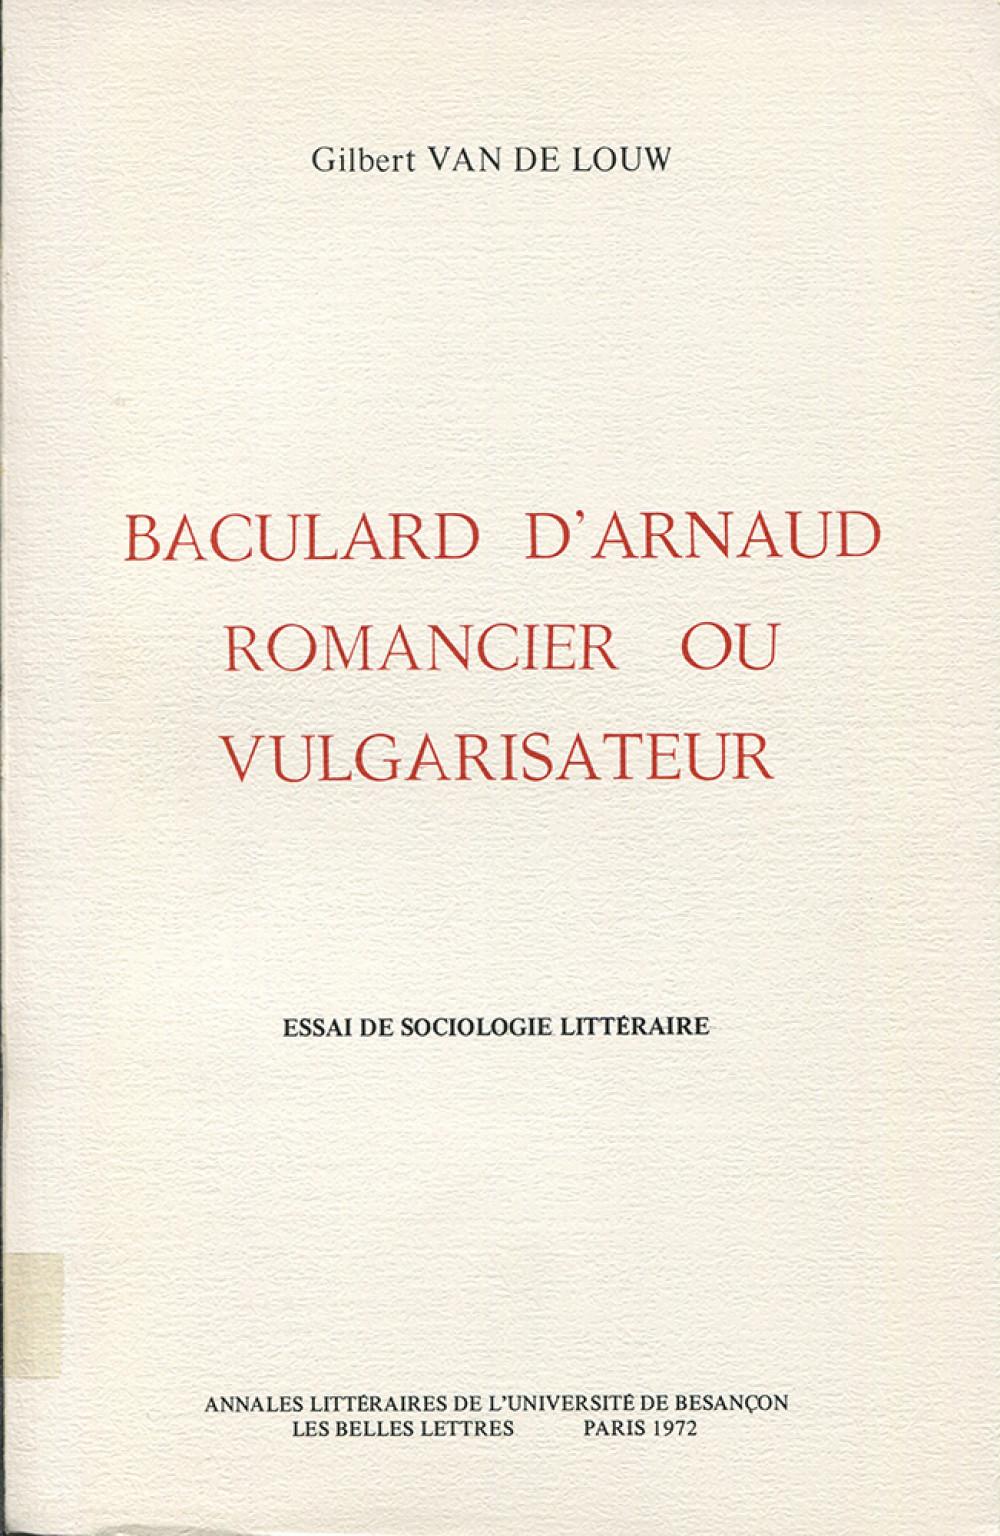 Baculard d'Arnaud romancier ou vulgarisateur